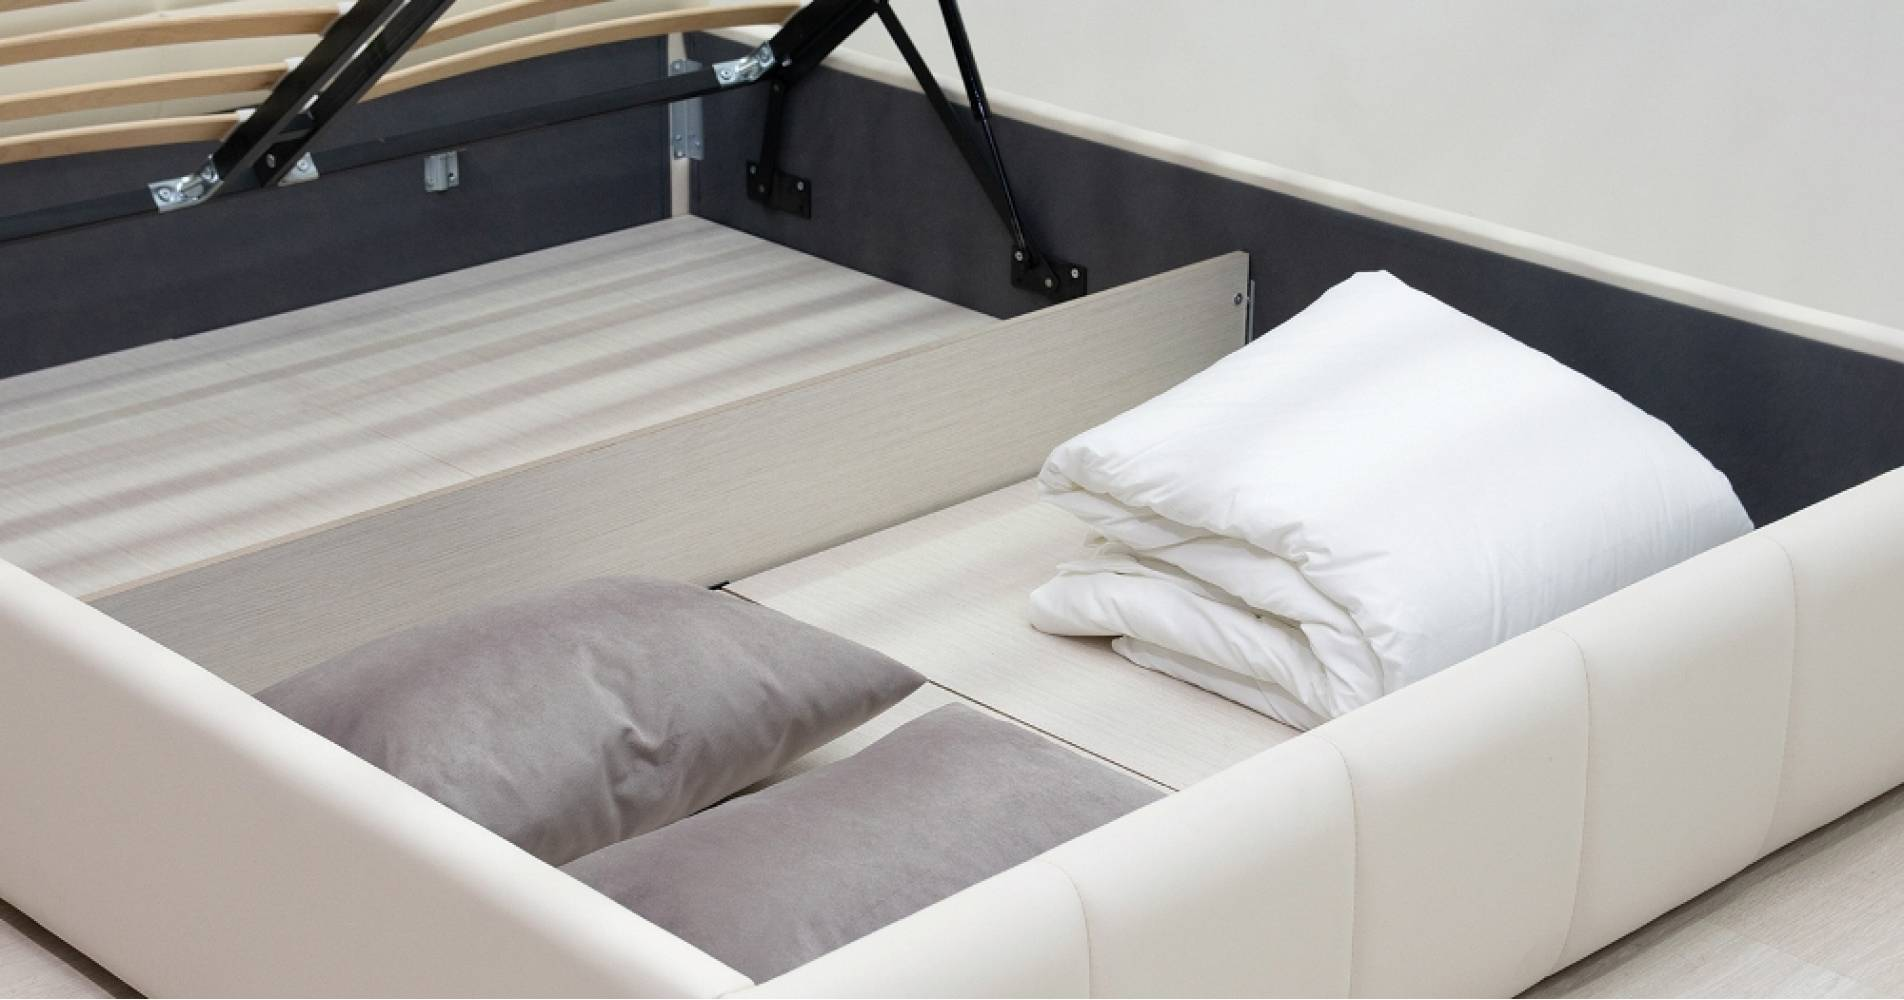 Дно кроватное 1600 Стандарт ЛДСП для кровати ХЛОЯ (капучино)